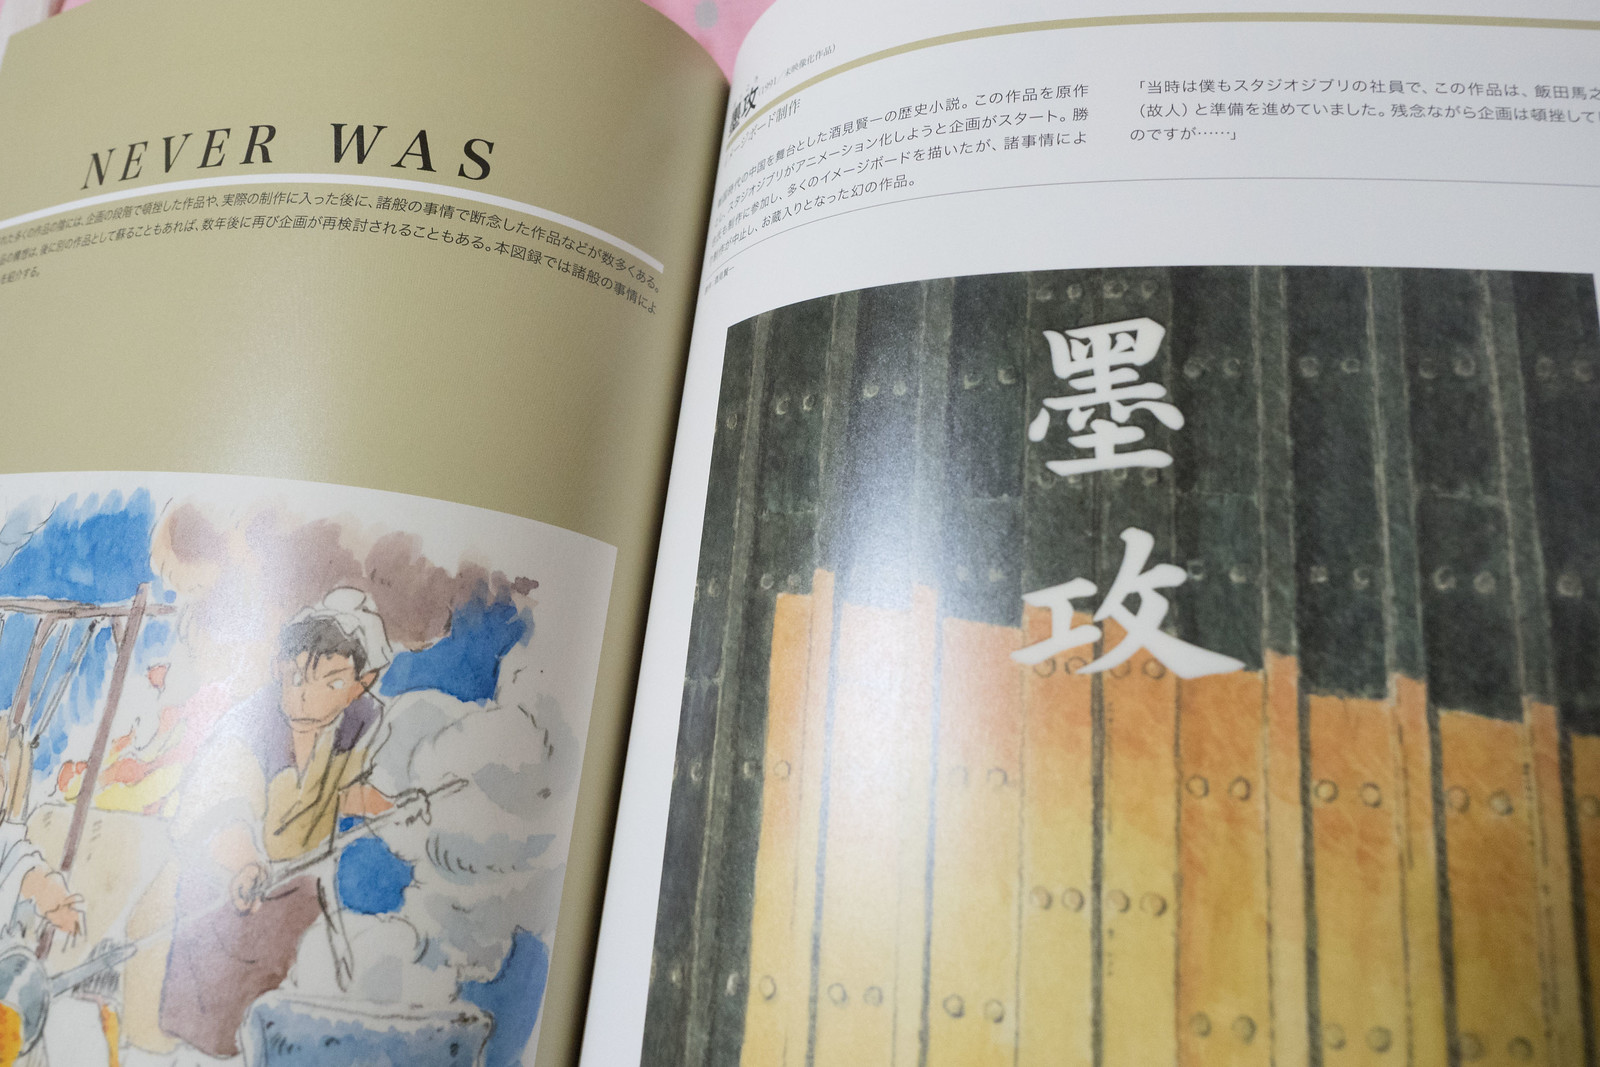 Ghibli_katsuyakondo-44